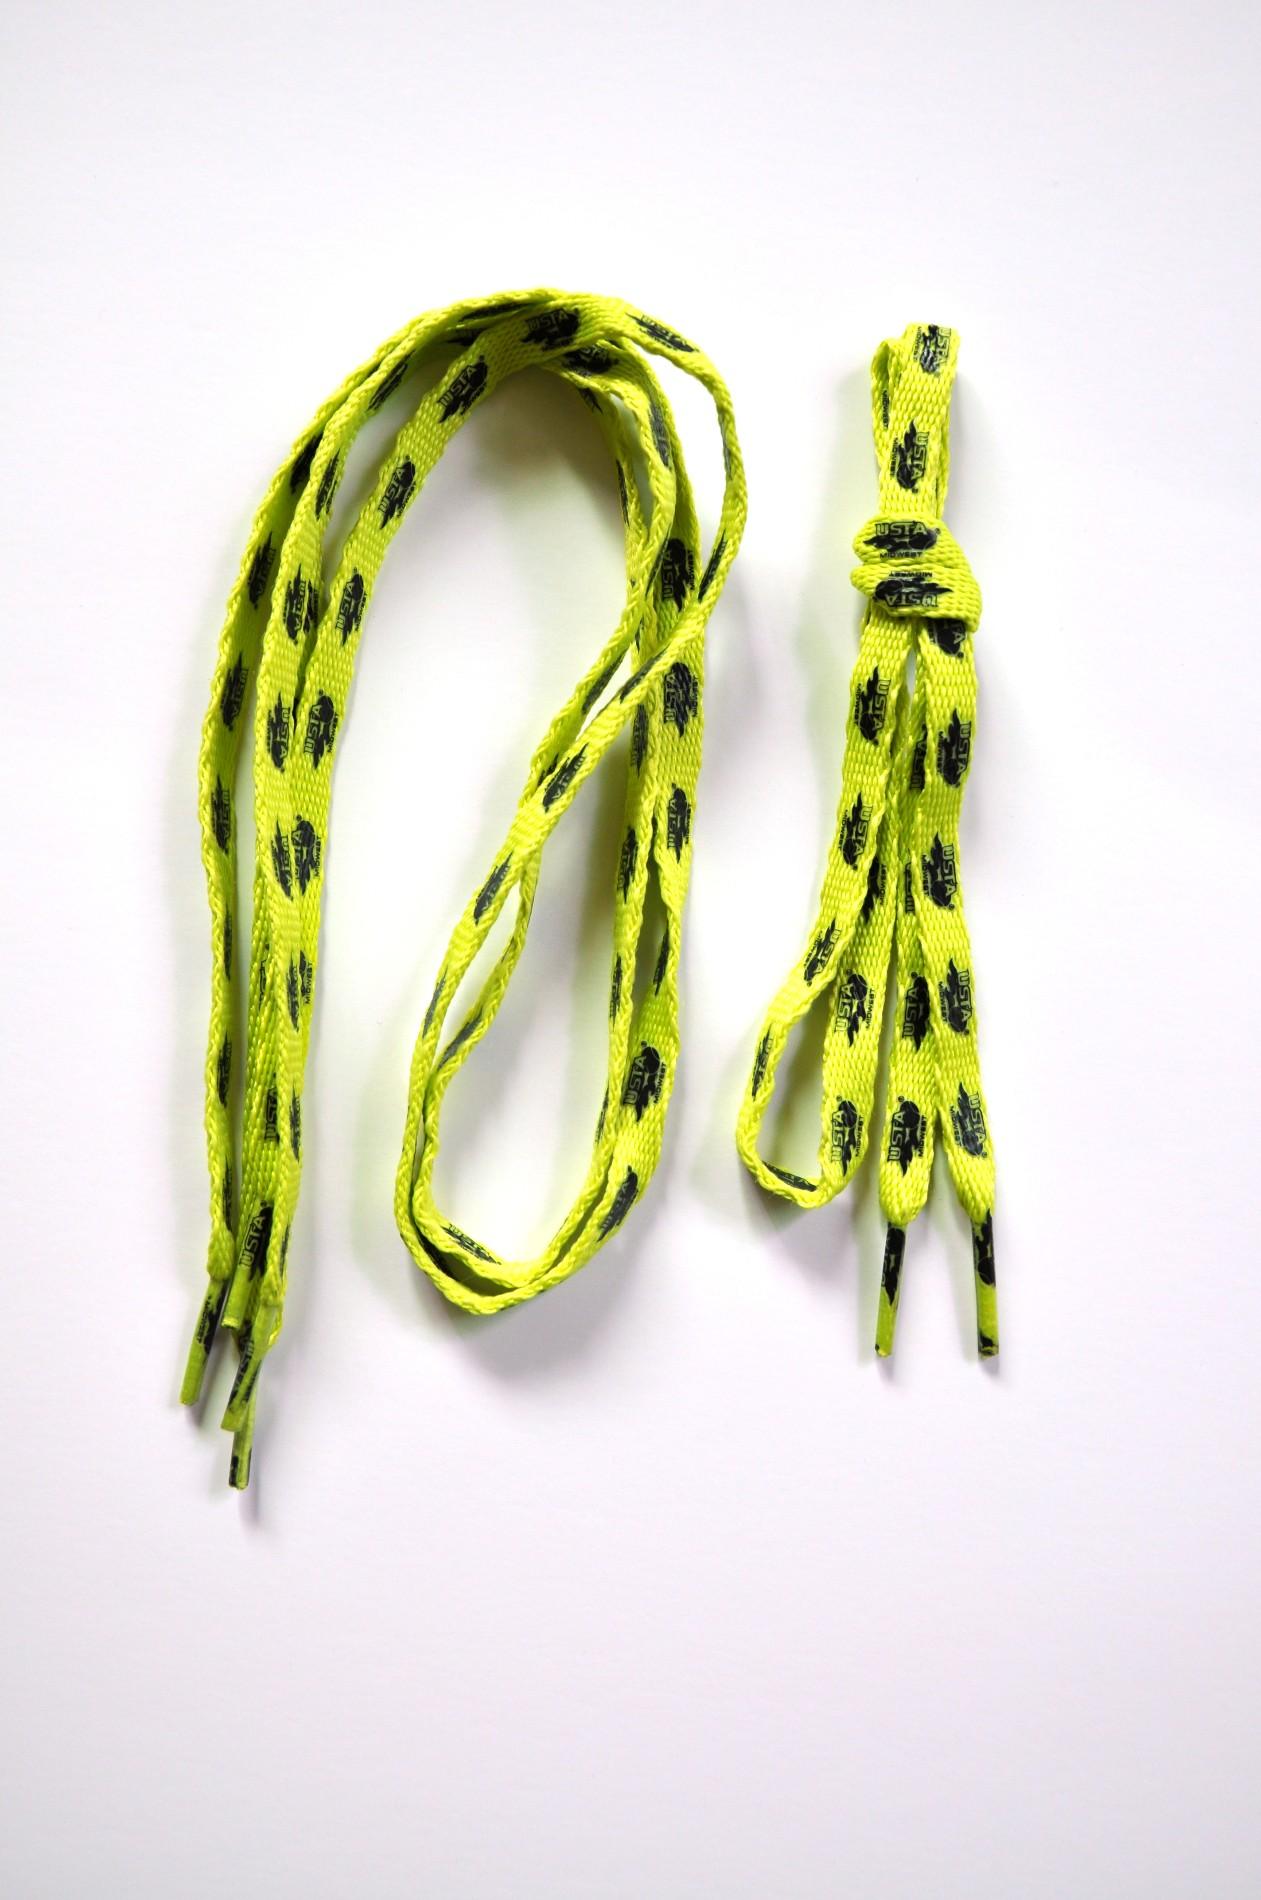 Cheap custom shoelaces Manufacturers, Cheap custom shoelaces Factory, Supply Cheap custom shoelaces